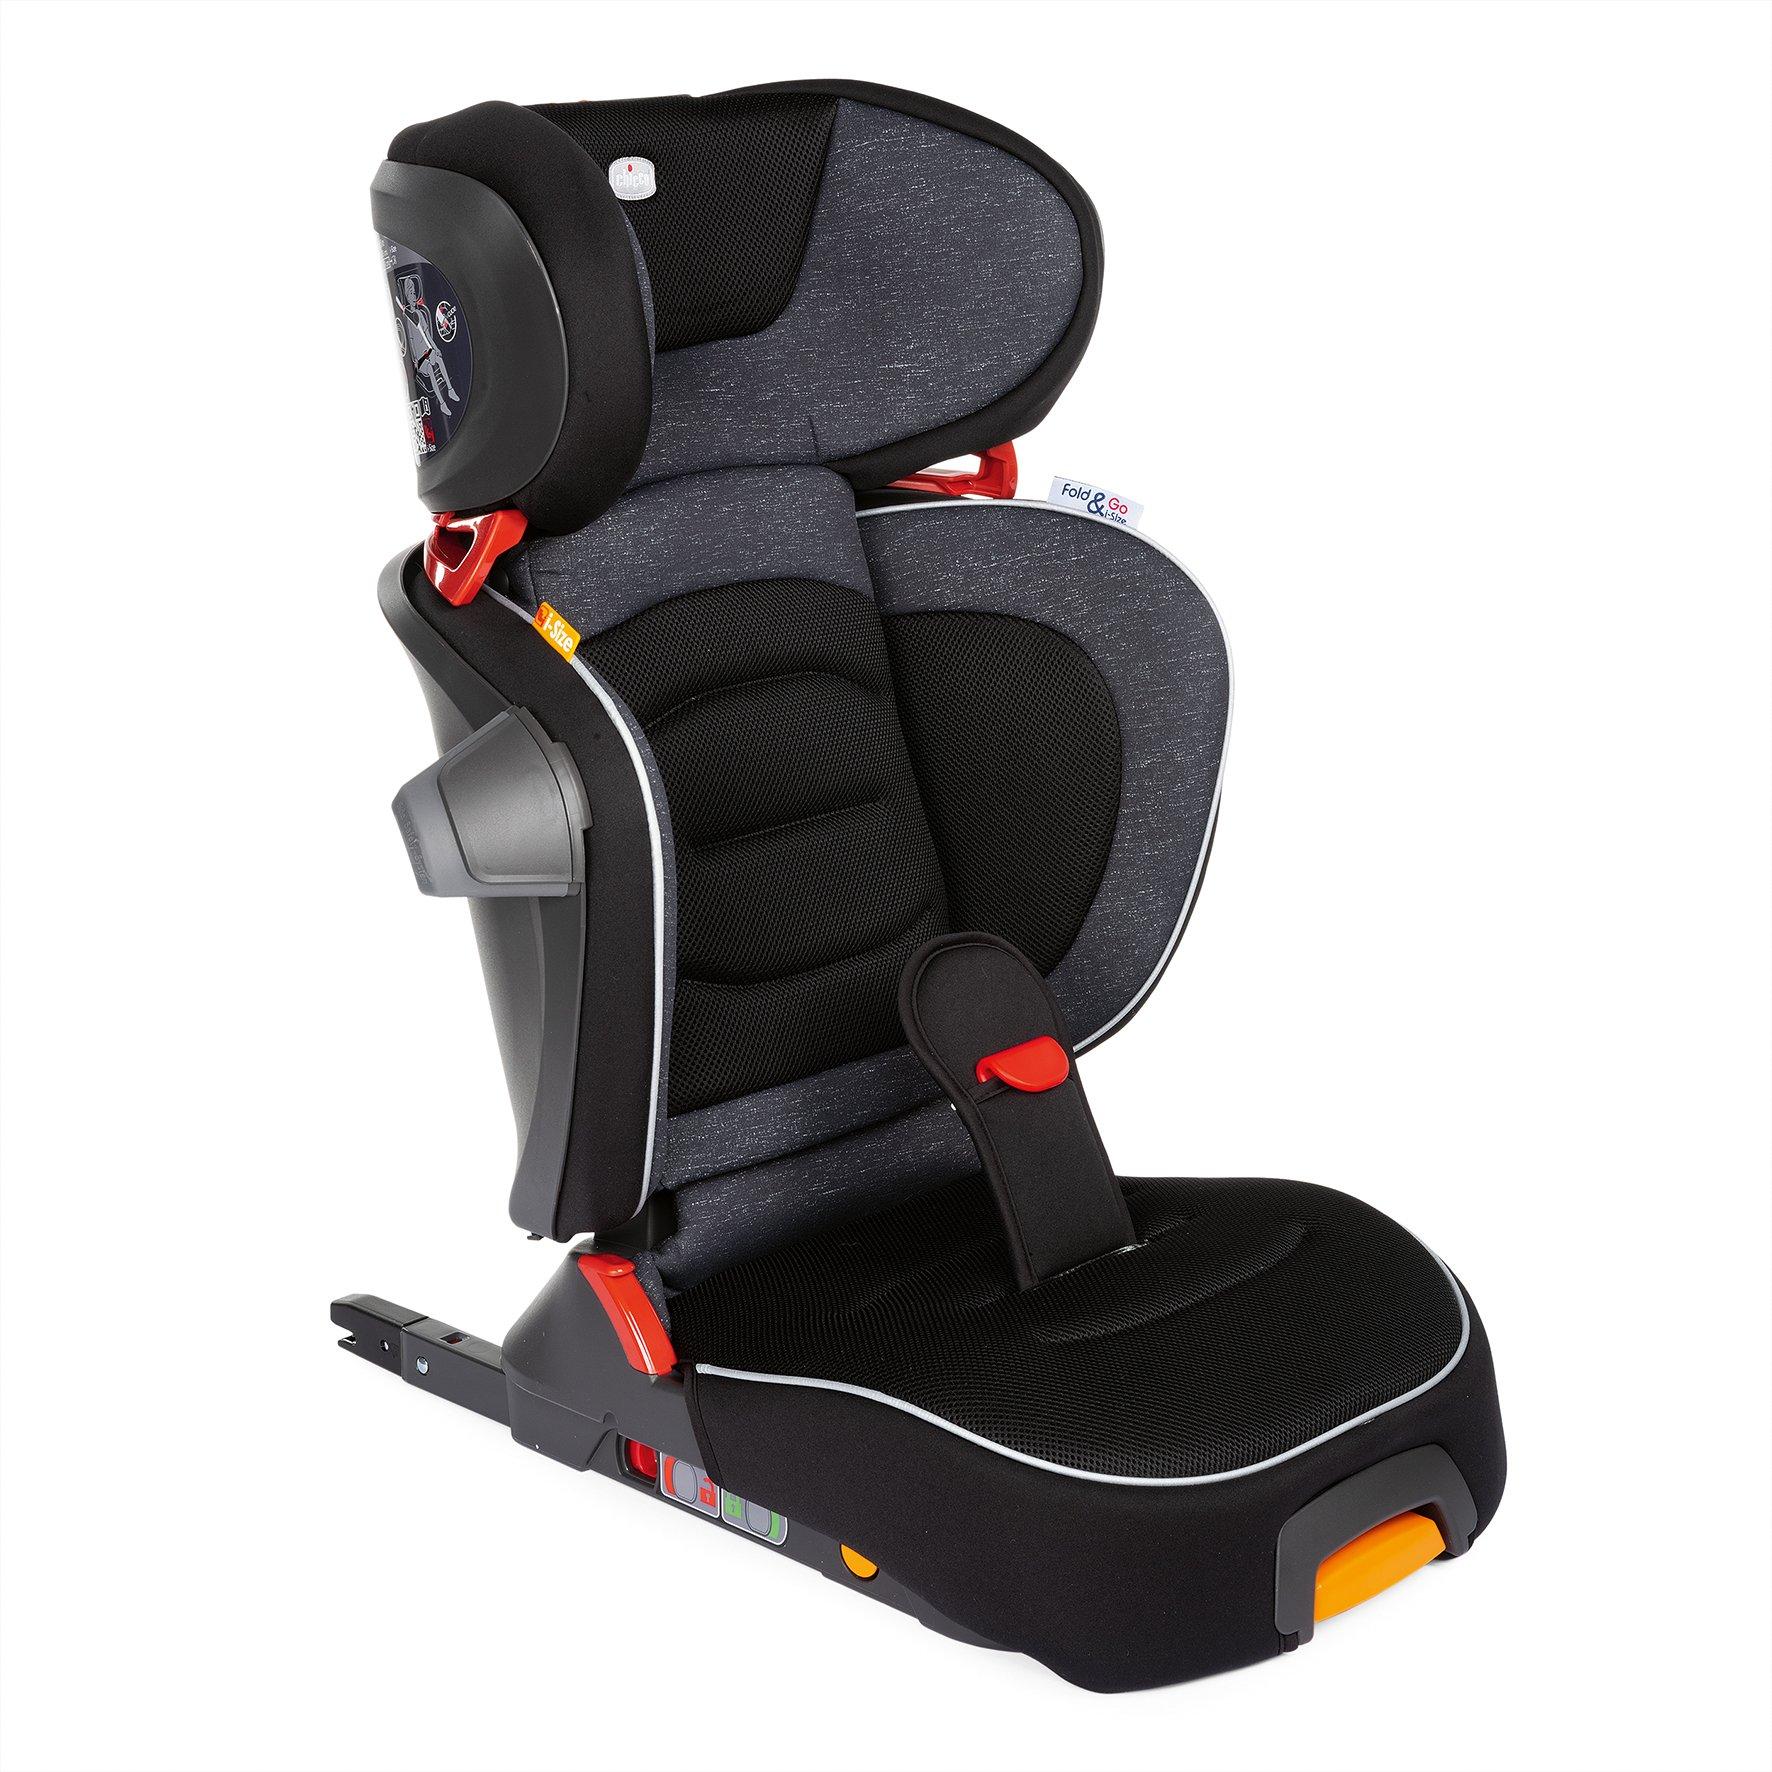 Chicco Child Car Seat Fold \u0026 Go i-Size